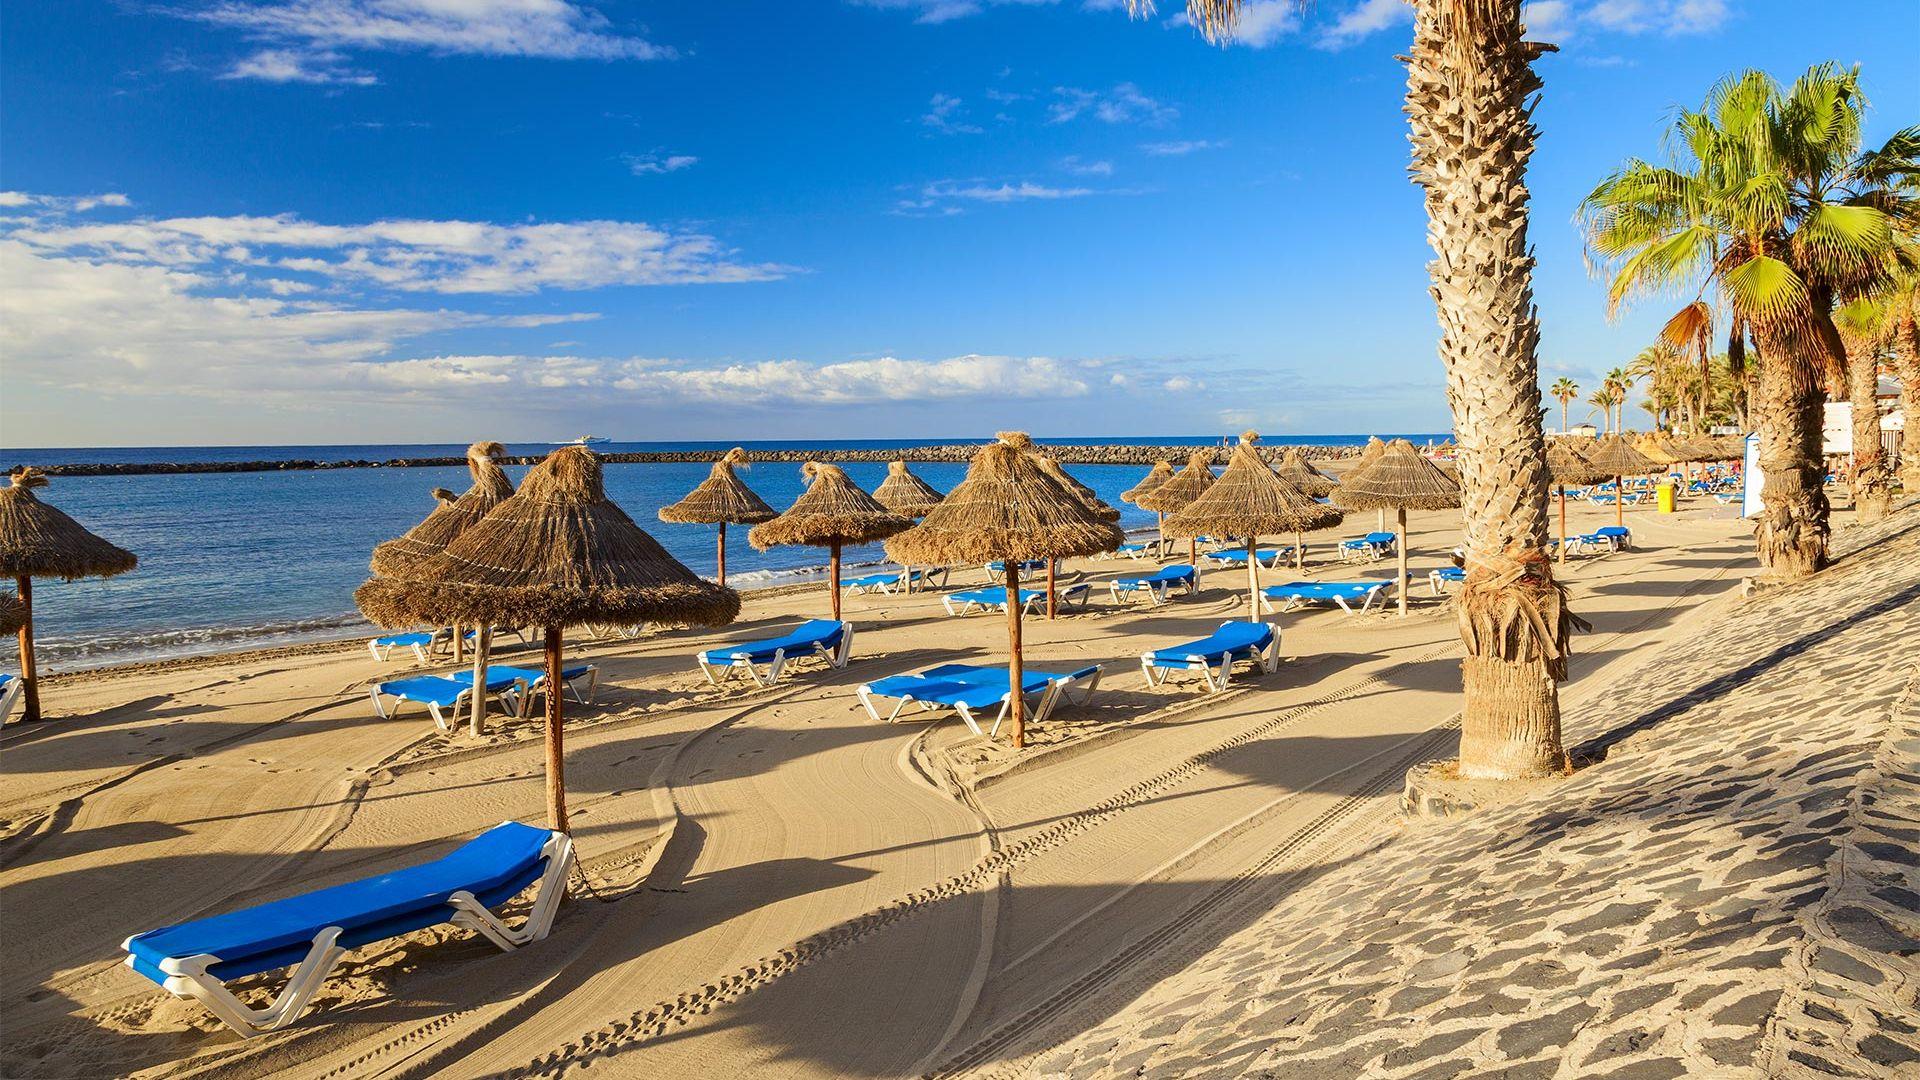 Sejur plaja Tenerife, 9 zile - 05 iulie 2021